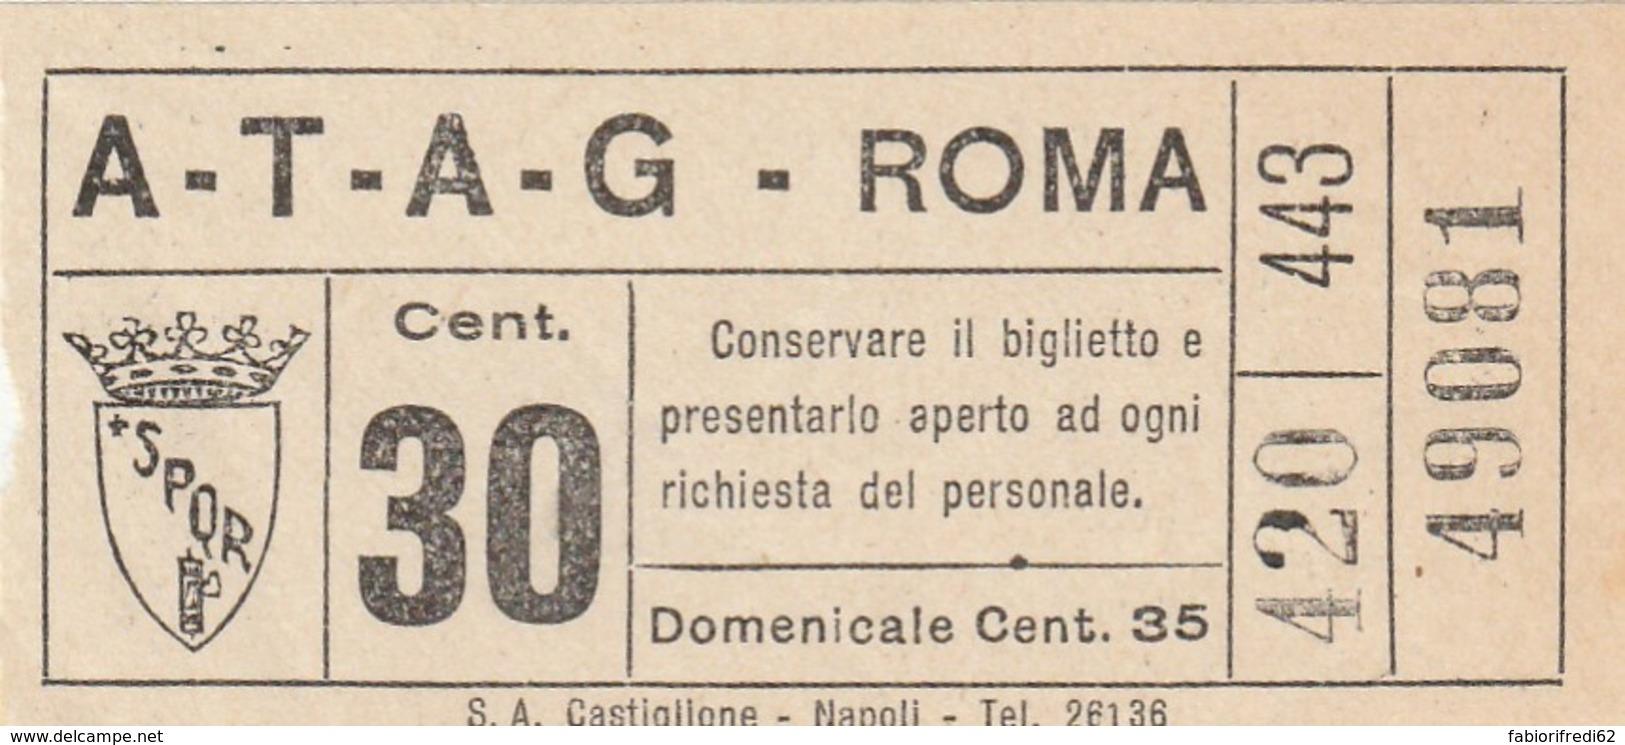 BIGLIETTO BUS TRAM ATAG ROMA (BX458 - Europa